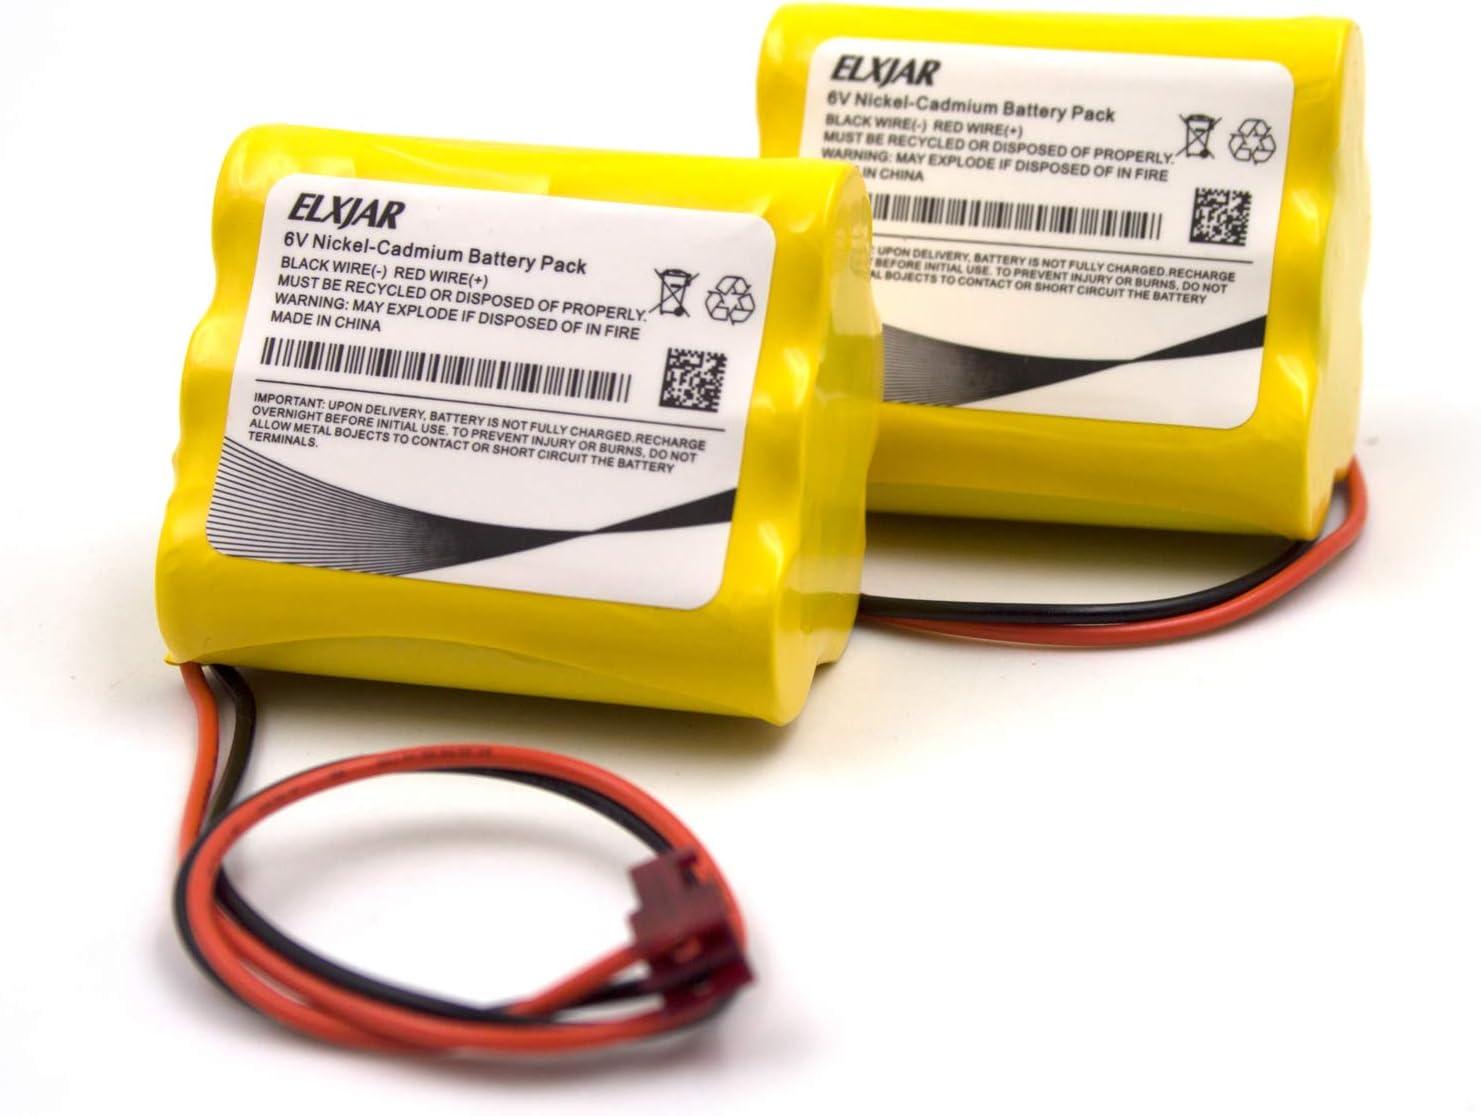 (2-Pack) 6V AA Ni-CD Battery Pack Replacement for Sure-Lite 026-149, SL026-149, S/L 026-149, ANIC1204, Energizer 41B020AF17201, Dantona CUSTOM-55 Emergency Lighting : Health & Household